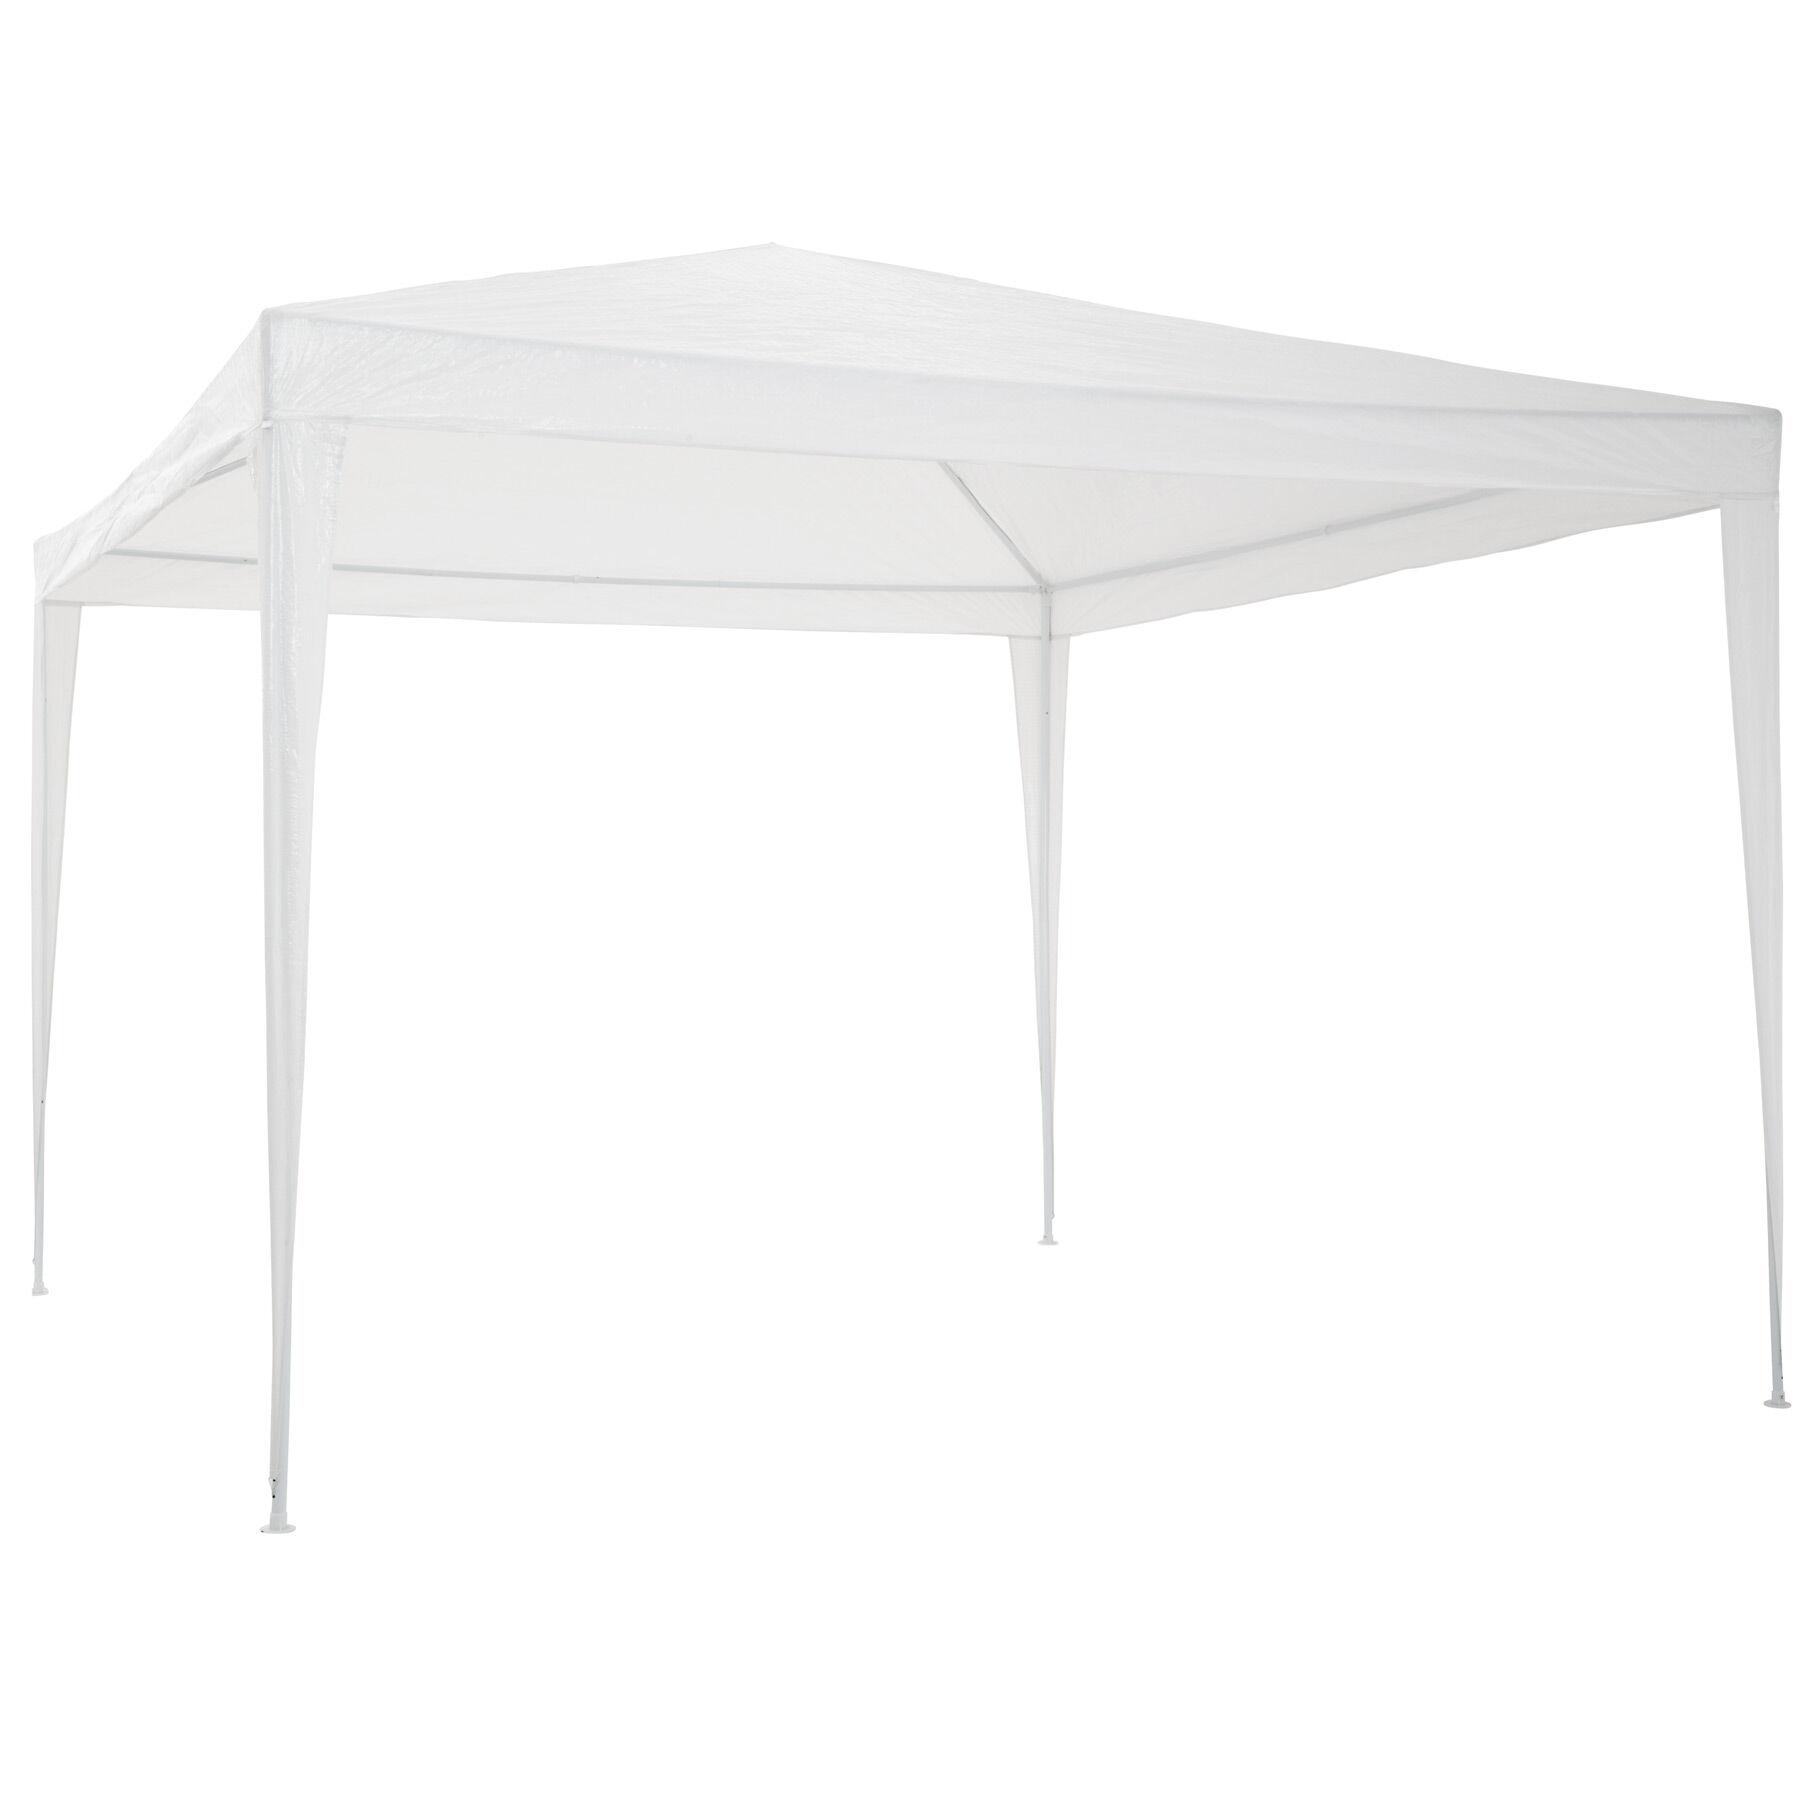 tectake gazebo da giardino 3x3 m - bianco